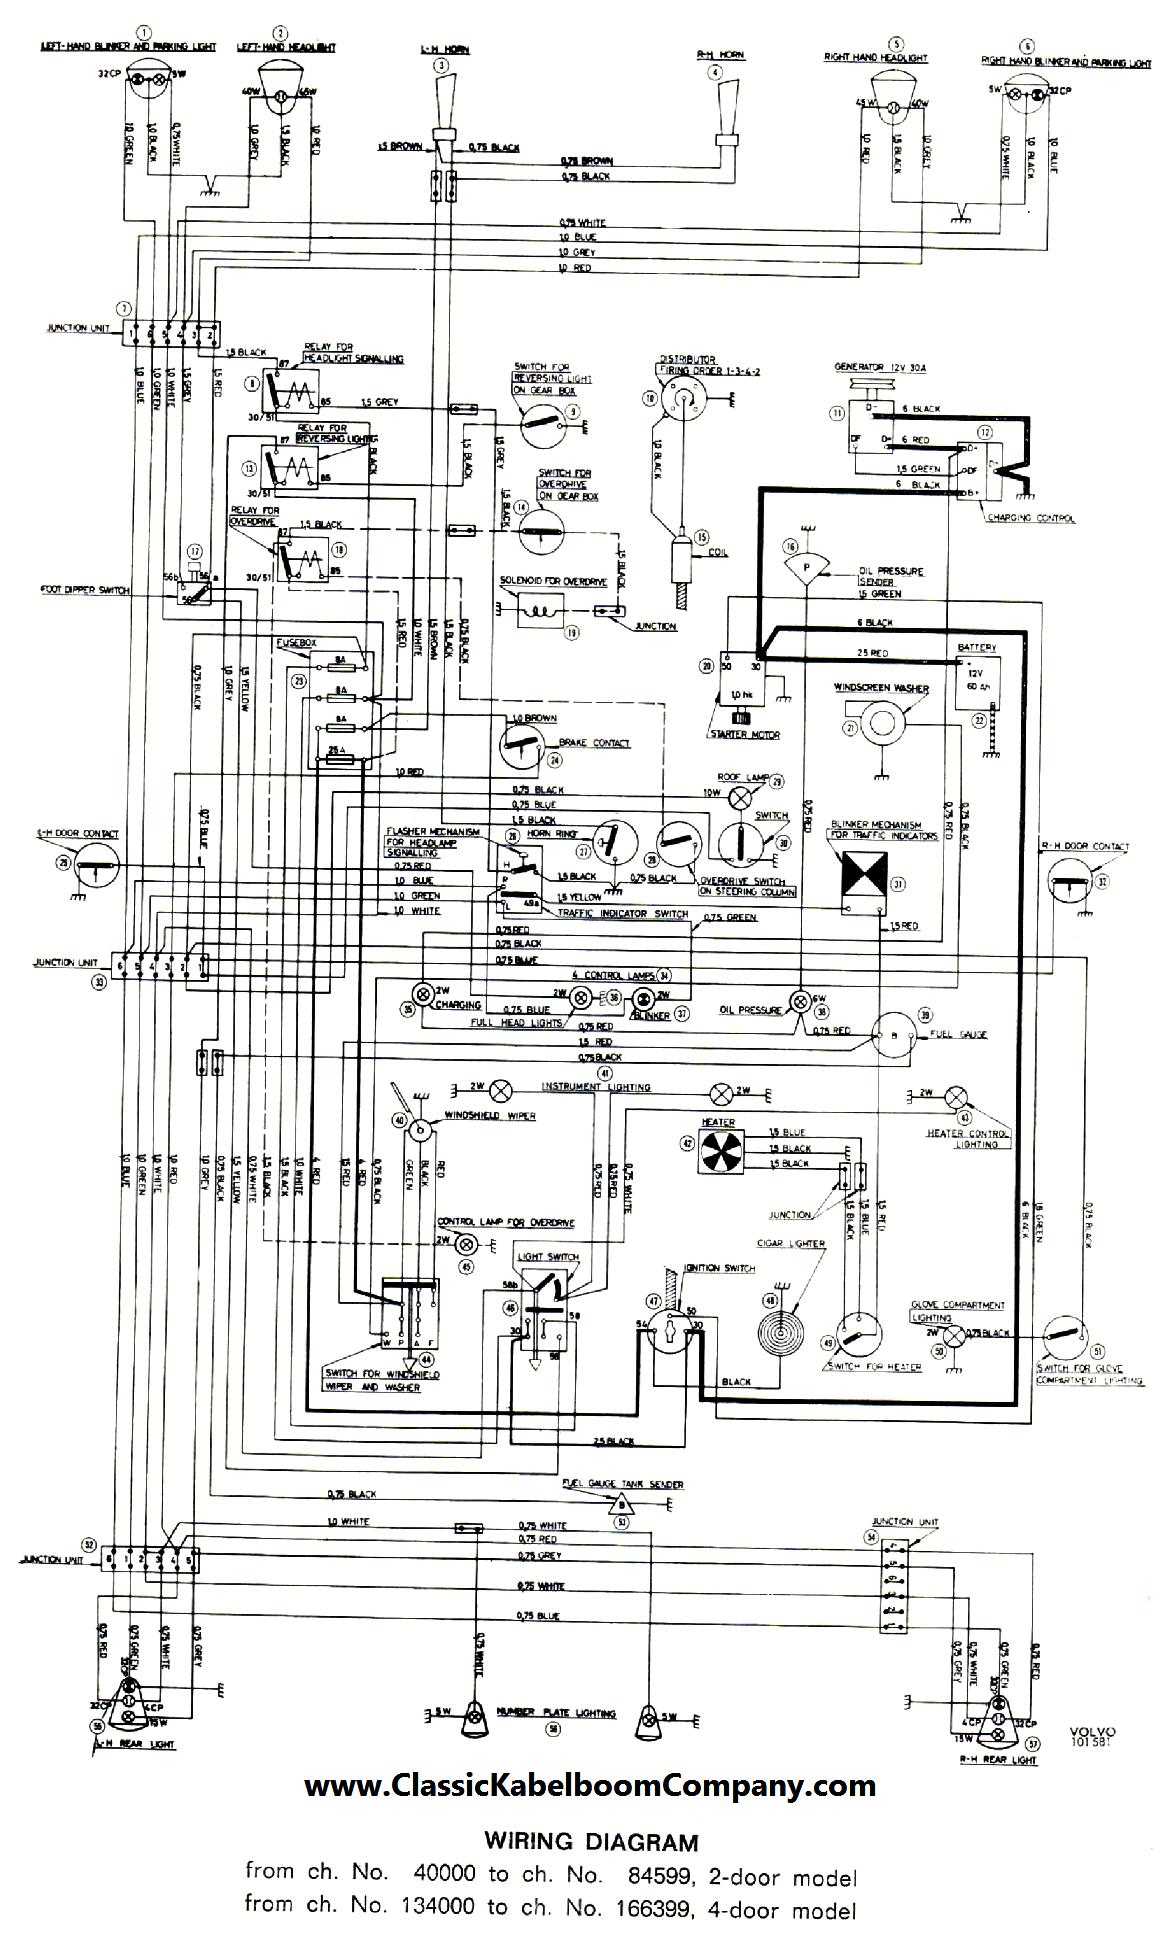 volvo truck wiring diagram security remote start wire diagram, wiring, free volvo wiring diagrams